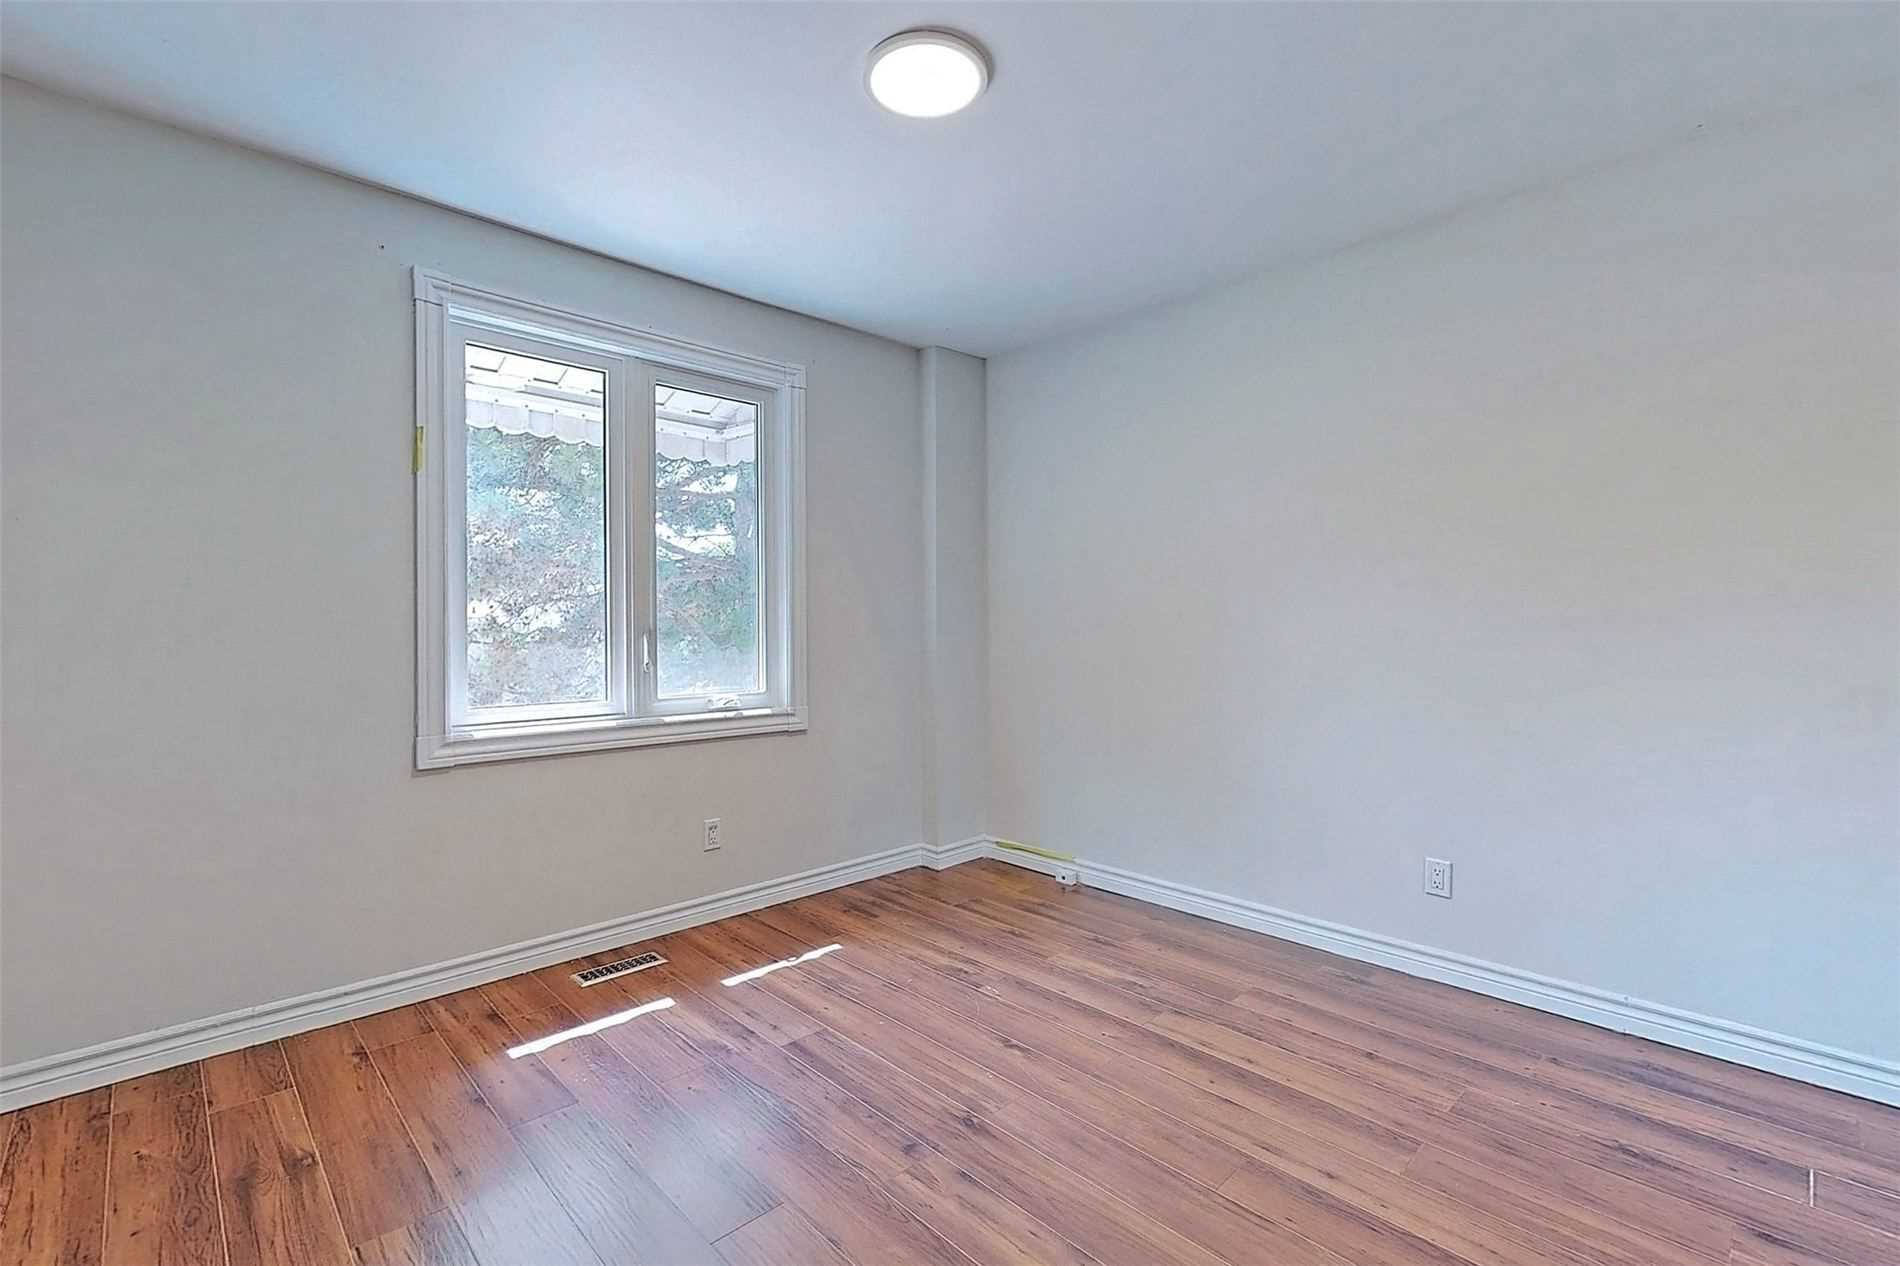 640 Irwin Cres, Newmarket, Ontario L3Y5A2, 3 Bedrooms Bedrooms, 6 Rooms Rooms,3 BathroomsBathrooms,Detached,For Sale,Irwin,N5354362